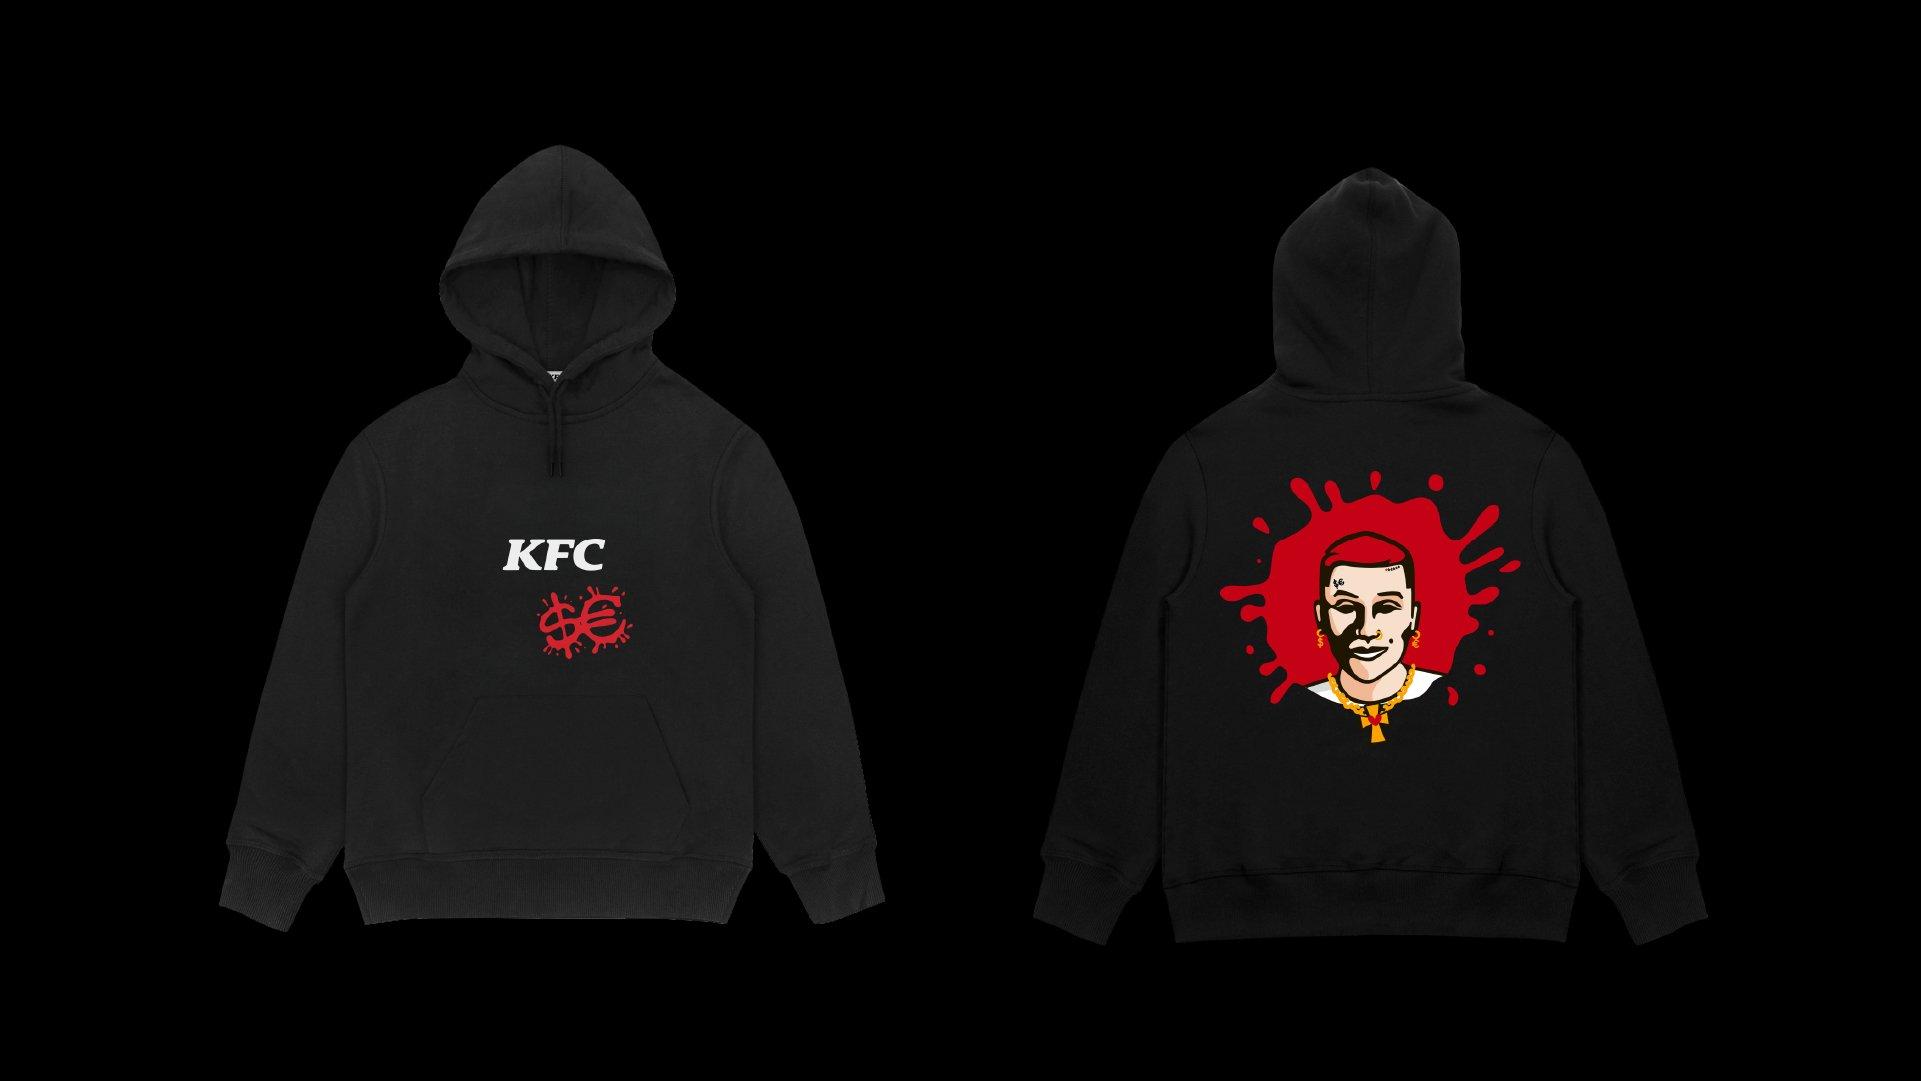 SFERA KFC MERCH 2020 hoodies 01